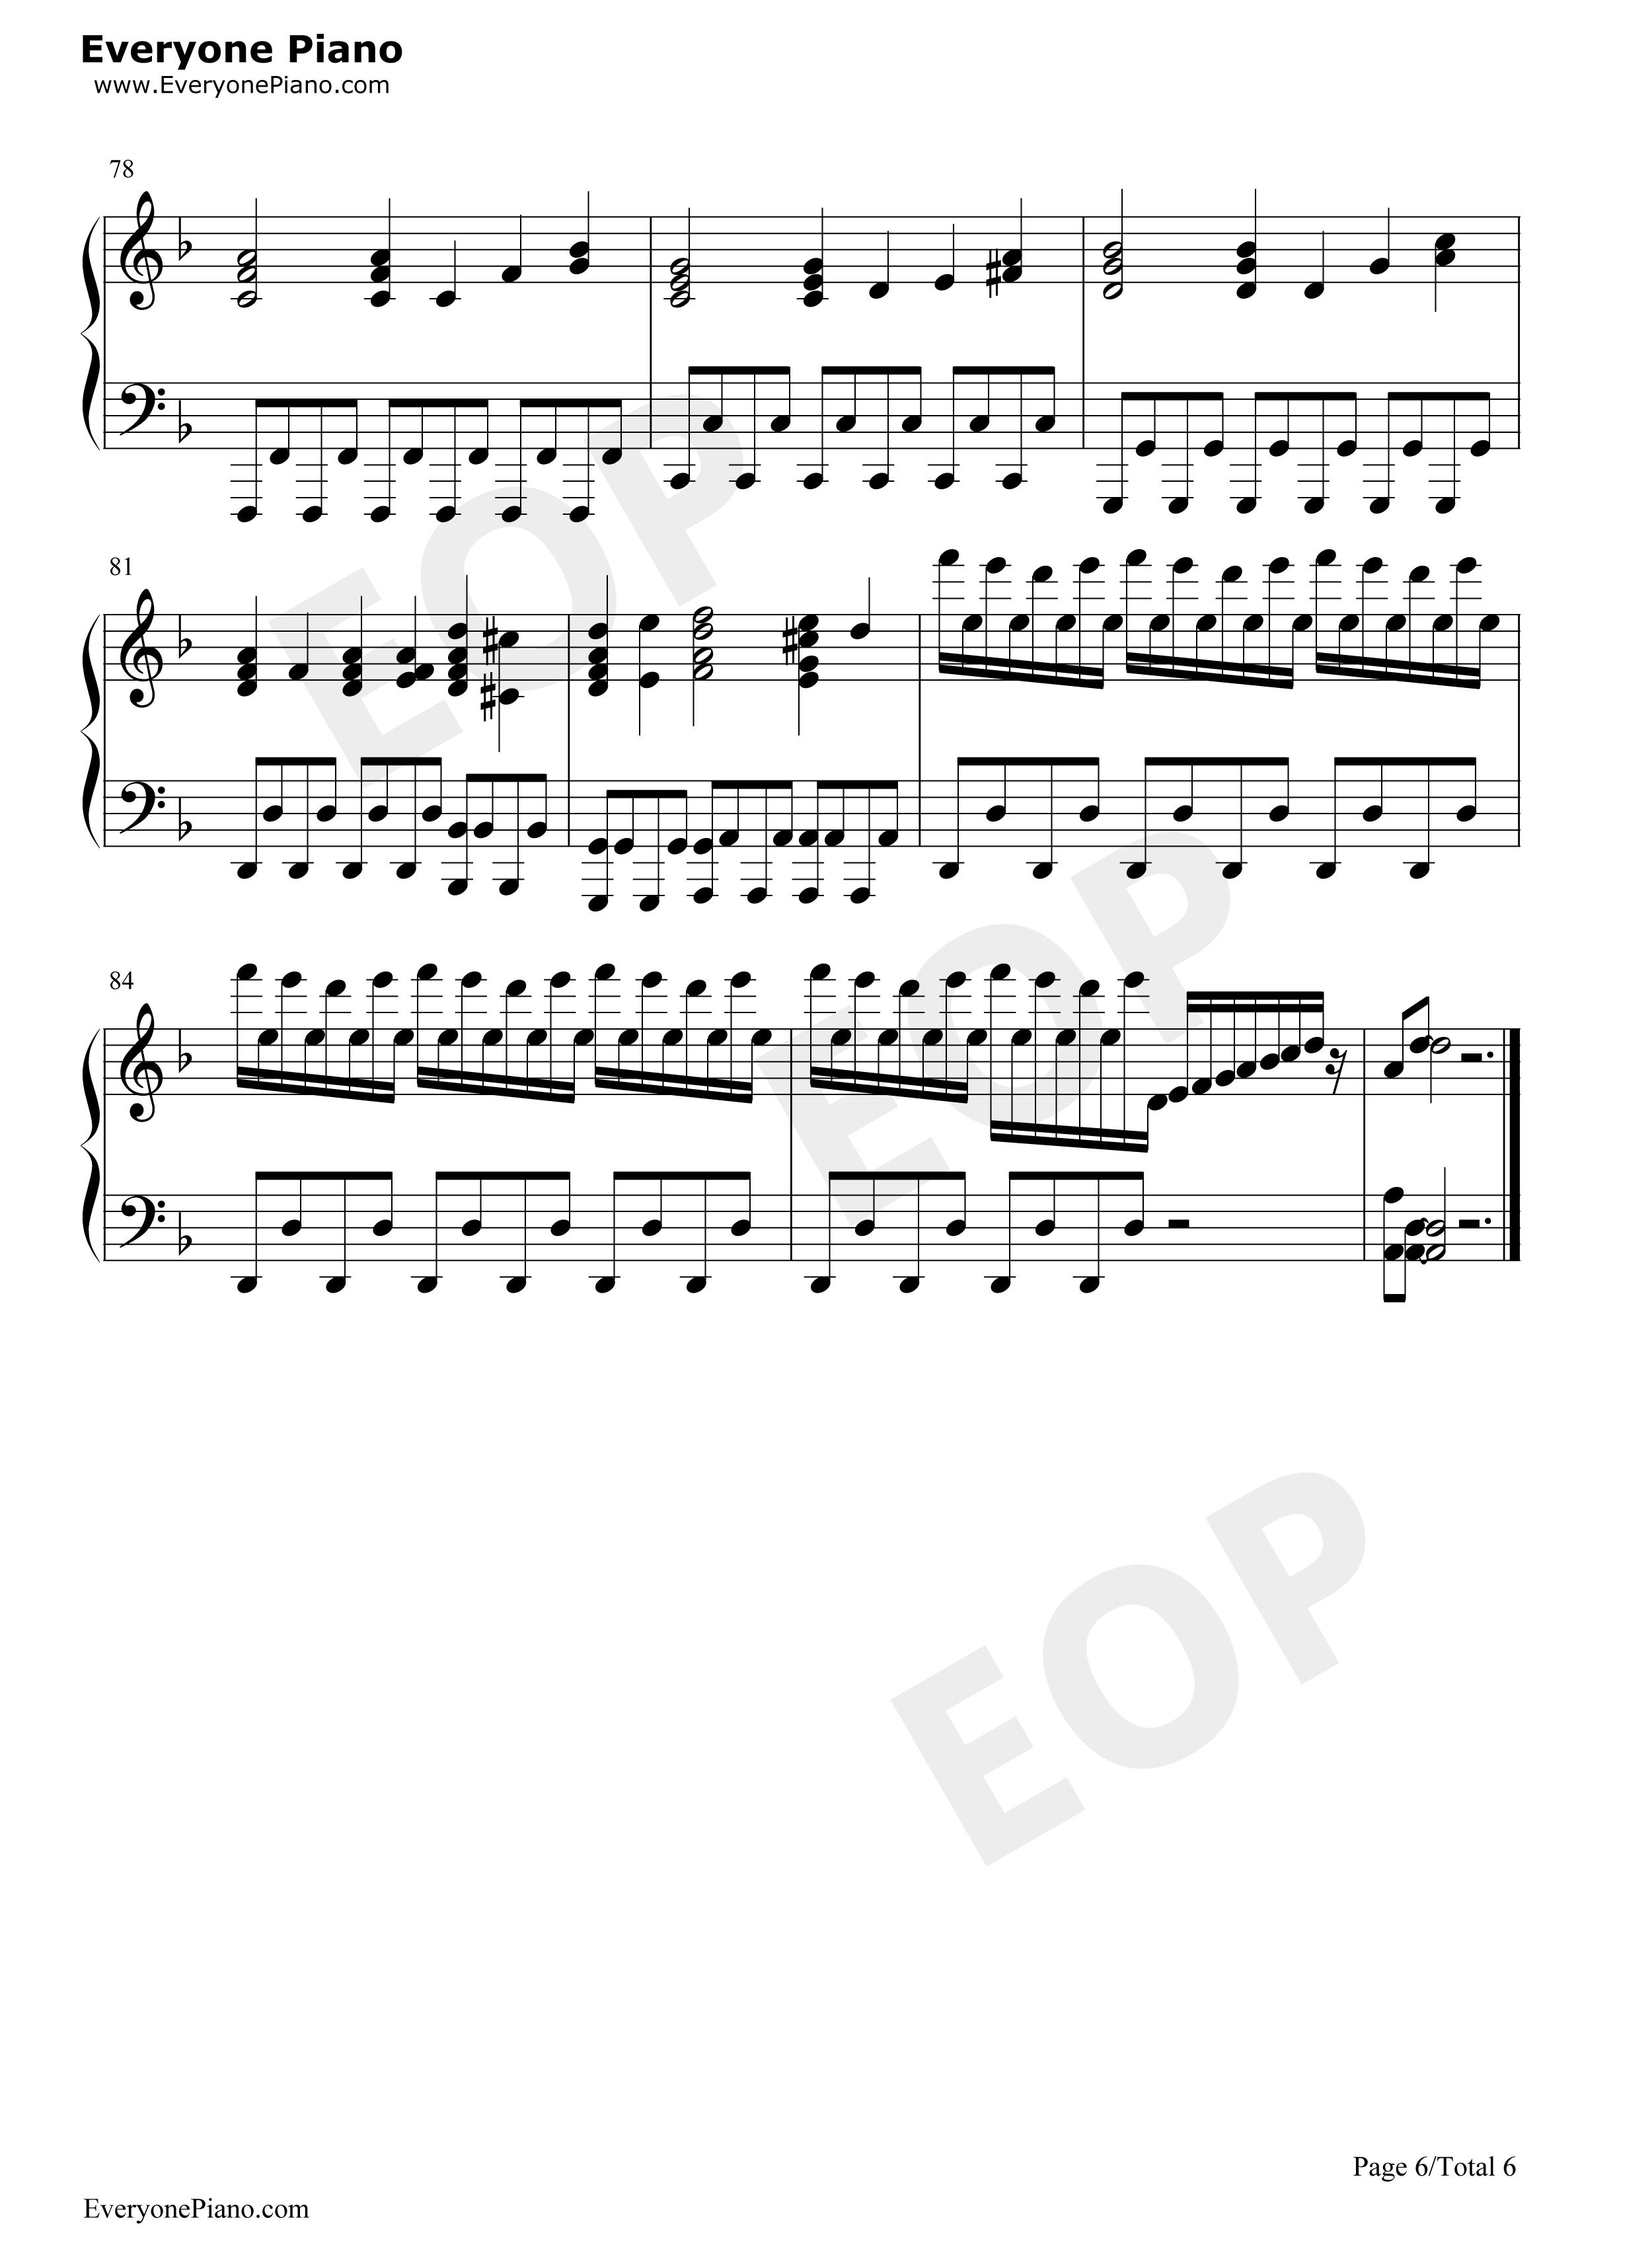 Handels Sarabande Maksim Mrvica Stave Preview 6 Free Piano Sheet